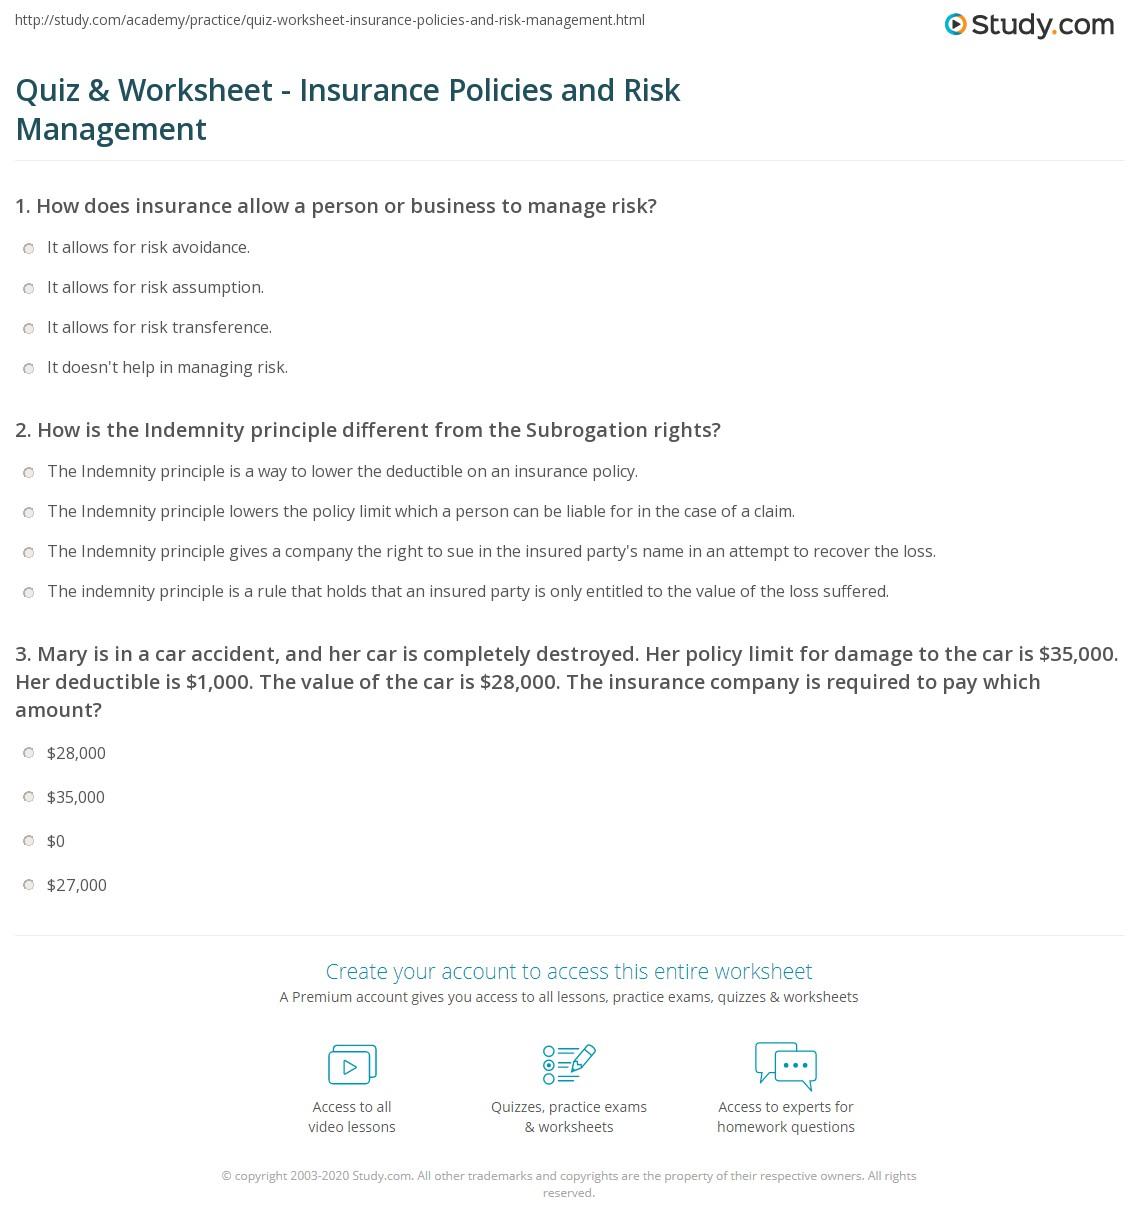 Quiz & Worksheet - Insurance Policies and Risk Management | Study.com